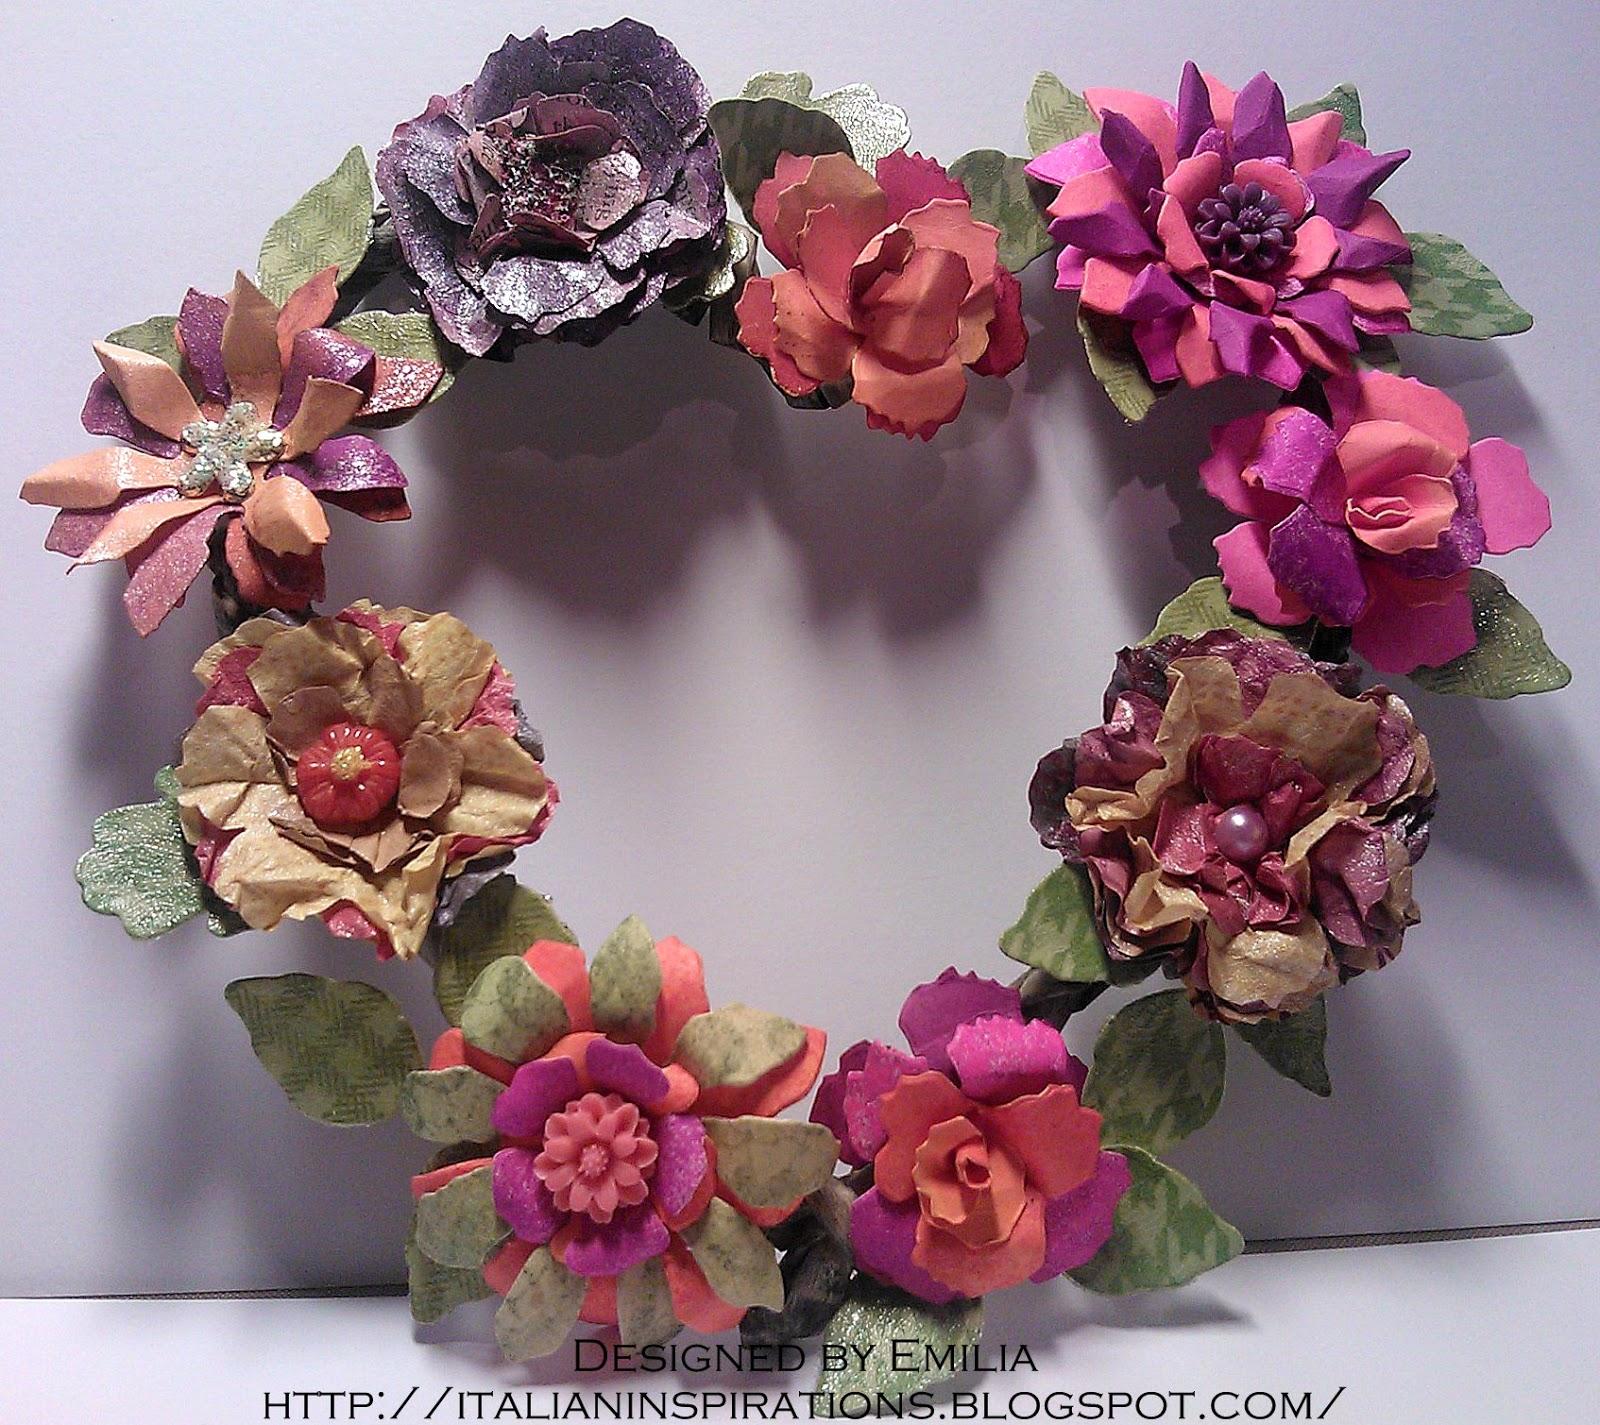 Emilia s Italian Inspirations Flower wreath